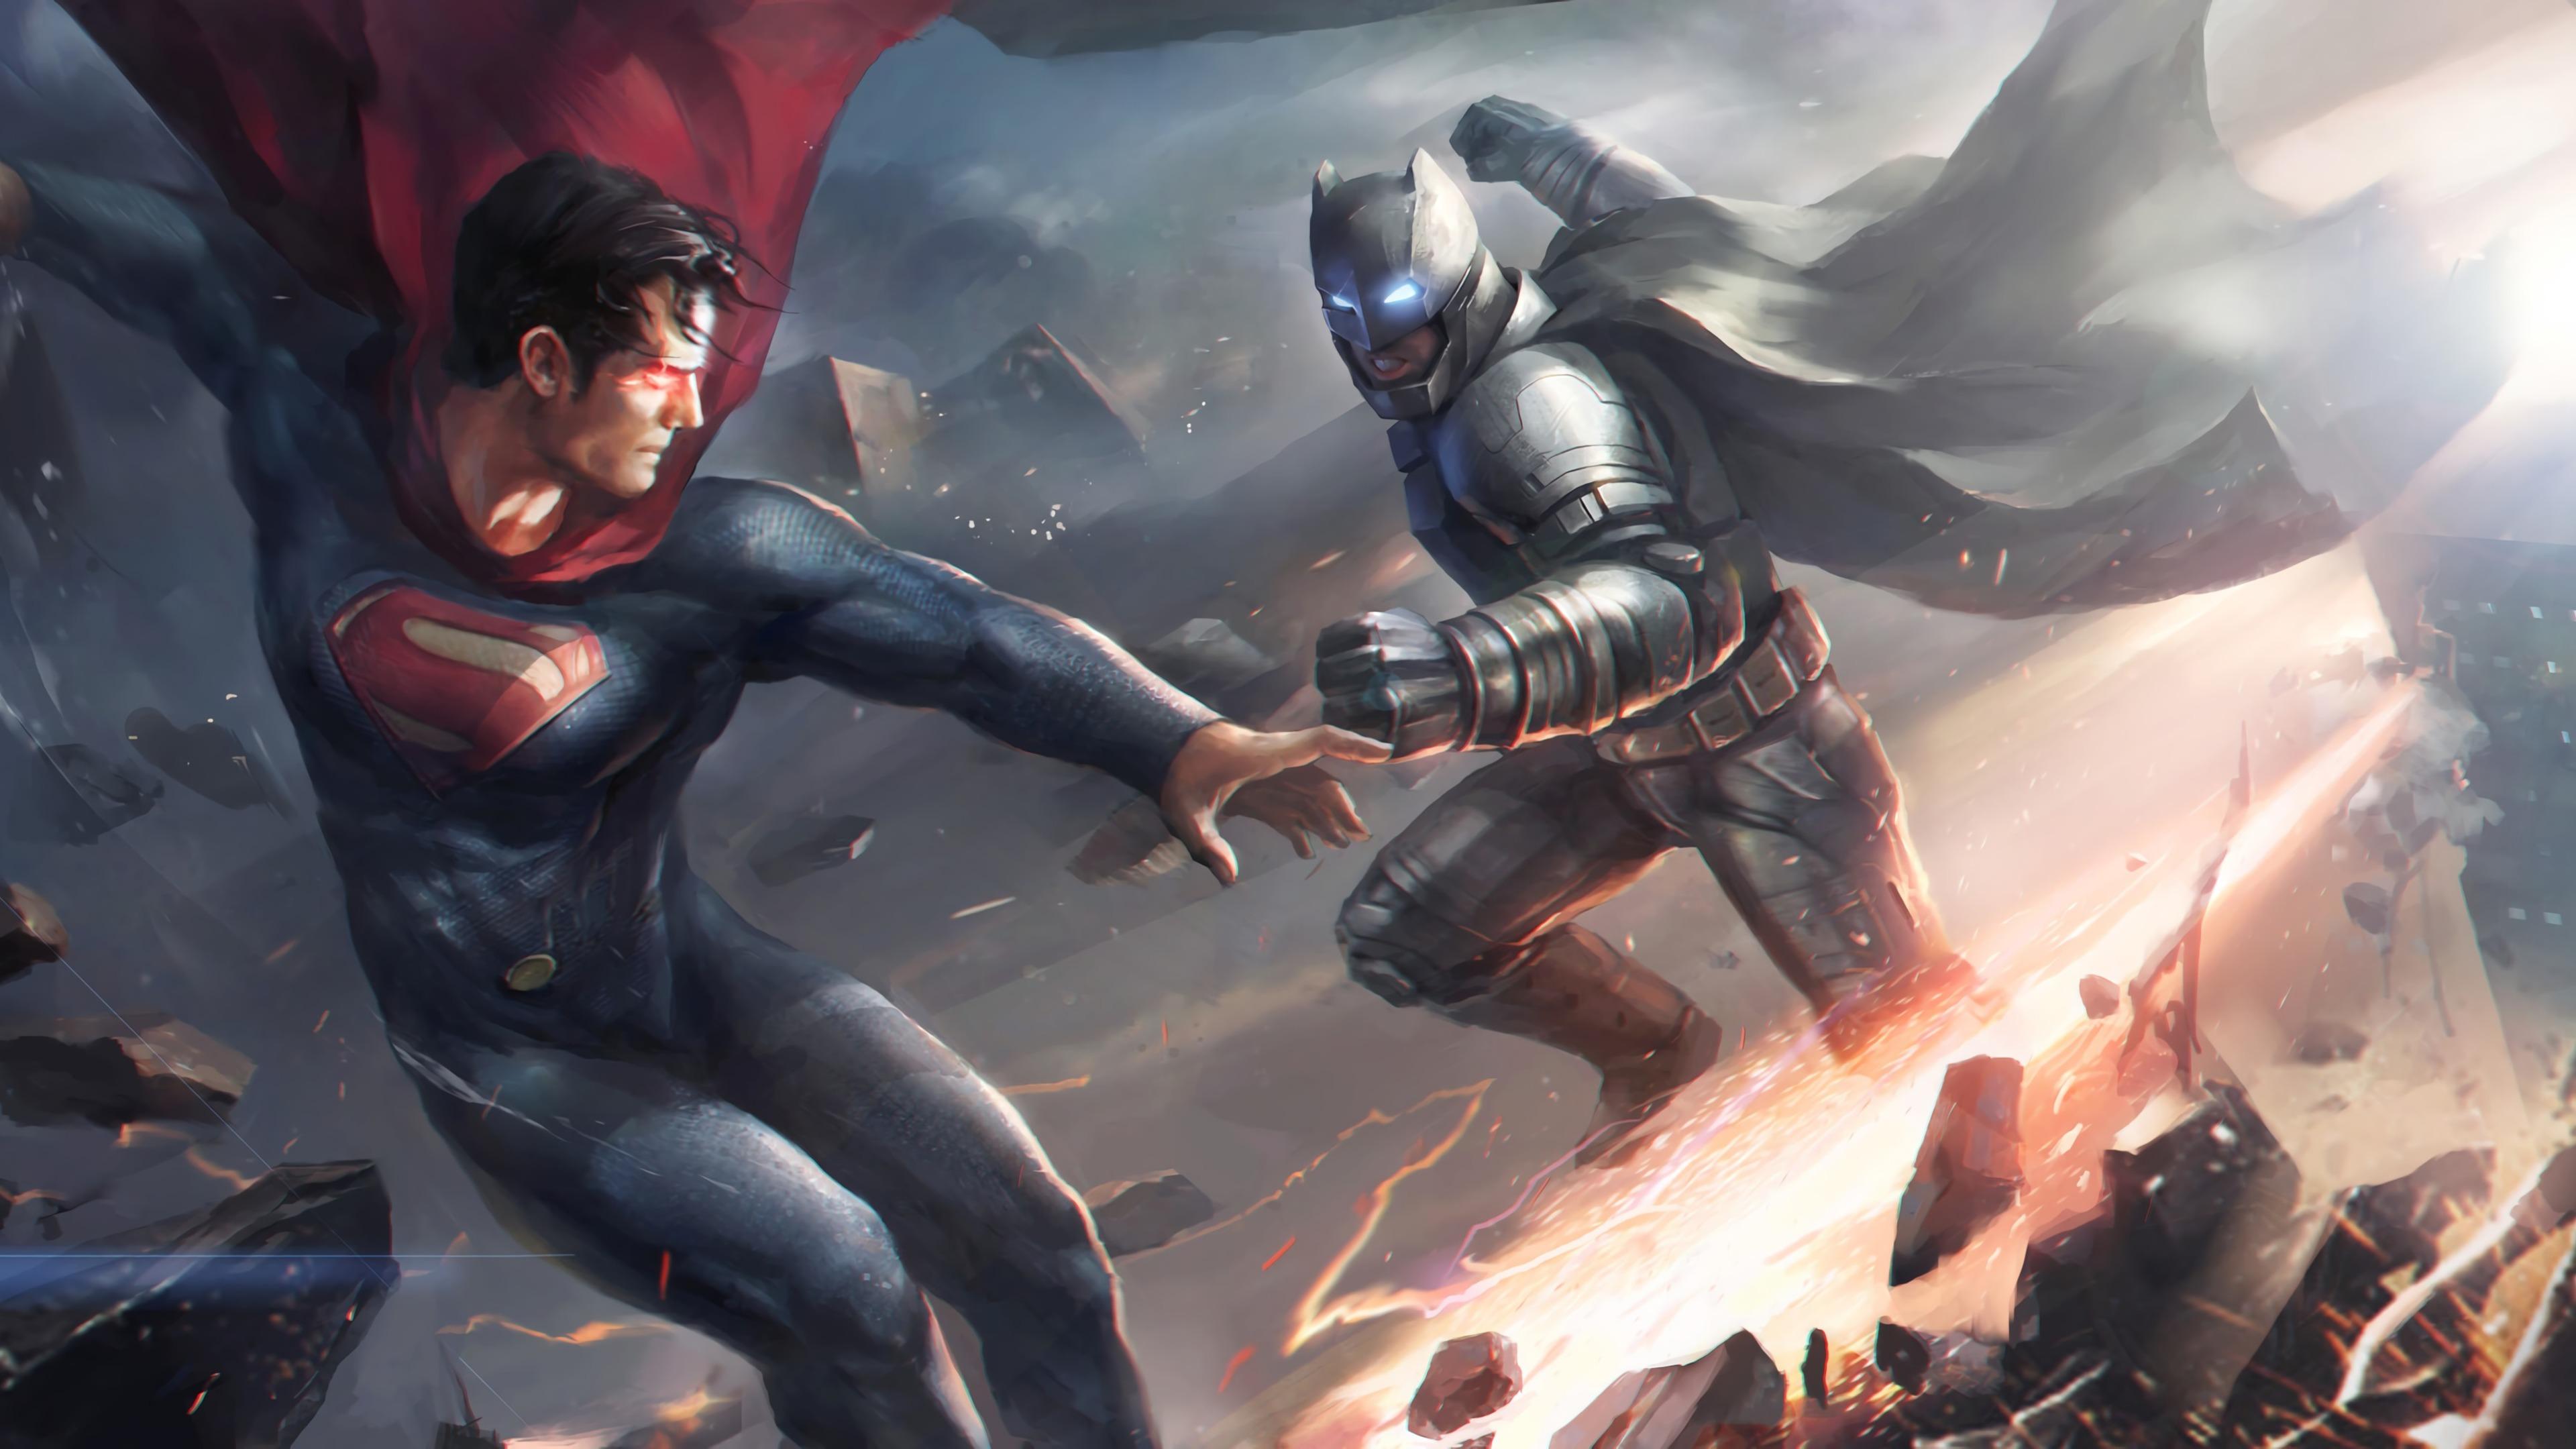 batman v superman arts 1568054752 - Batman V Superman Arts - superman wallpapers, superheroes wallpapers, hd-wallpapers, digital art wallpapers, batman wallpapers, artwork wallpapers, artstation wallpapers